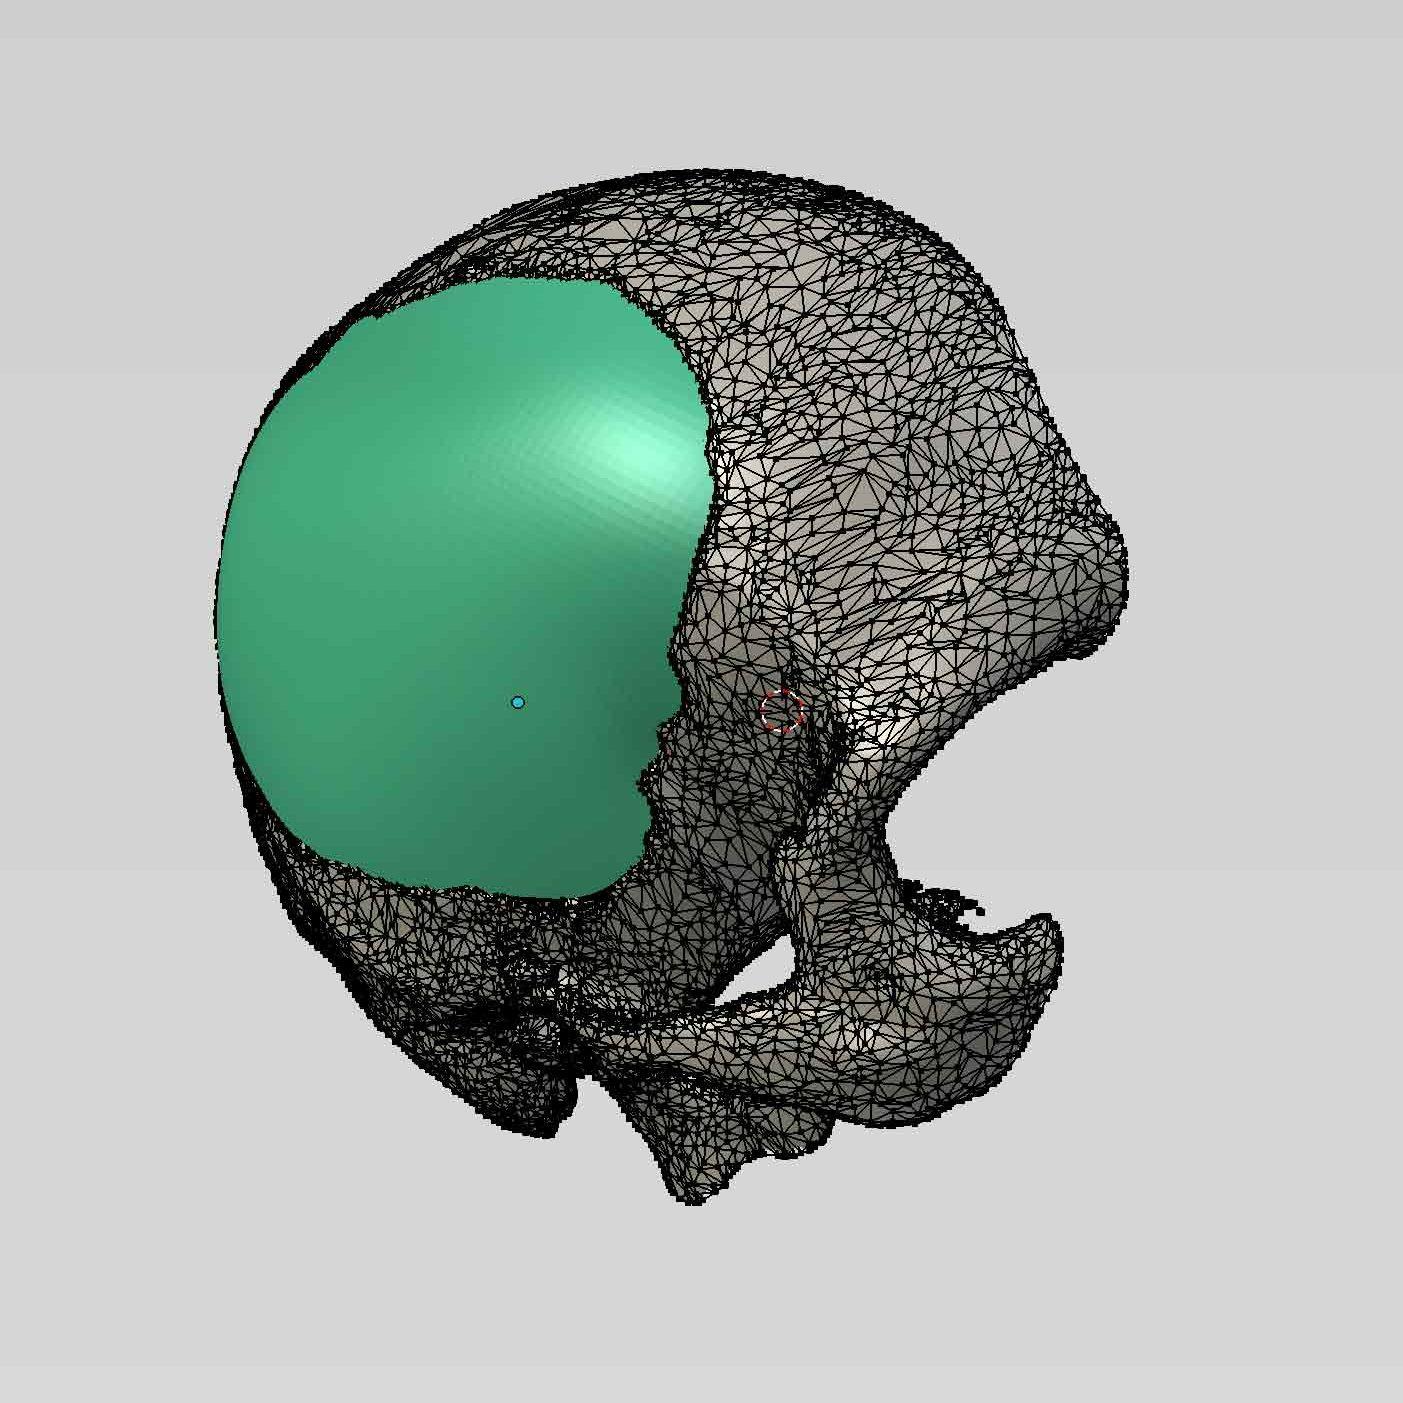 3d Printing in Medicine | WASP Med | 3D Printers | WASP